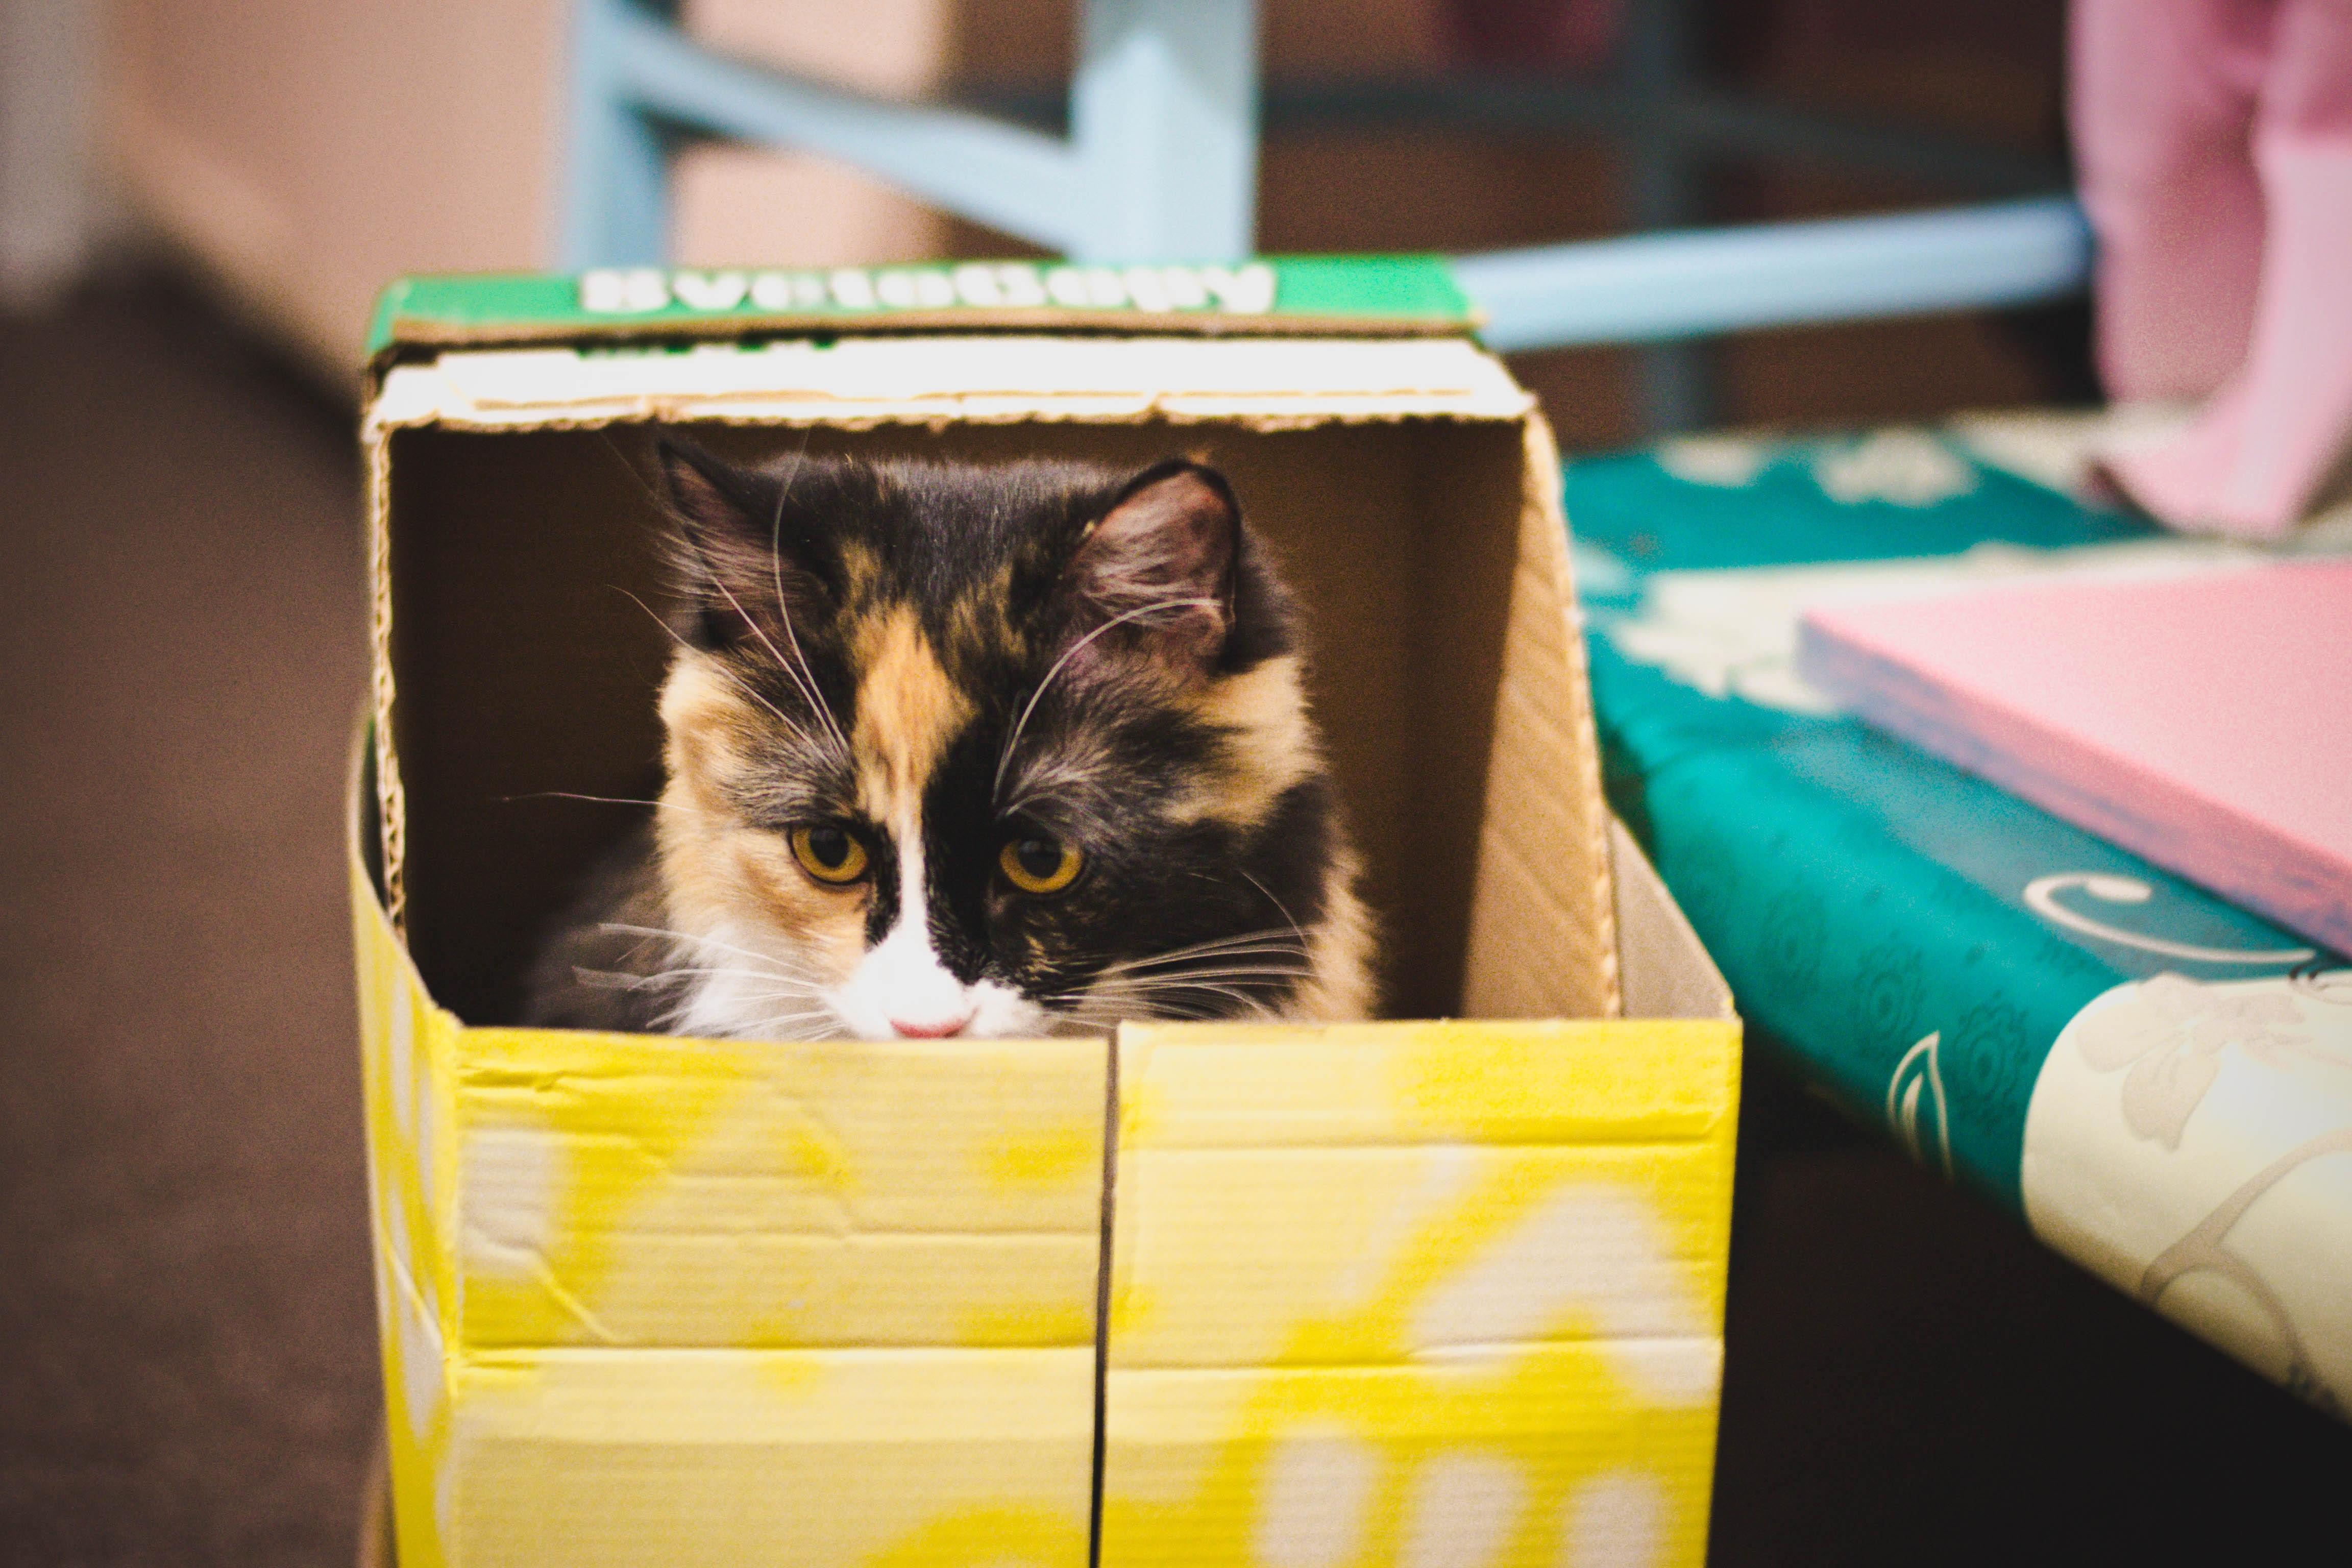 Картинка кошки в коробке